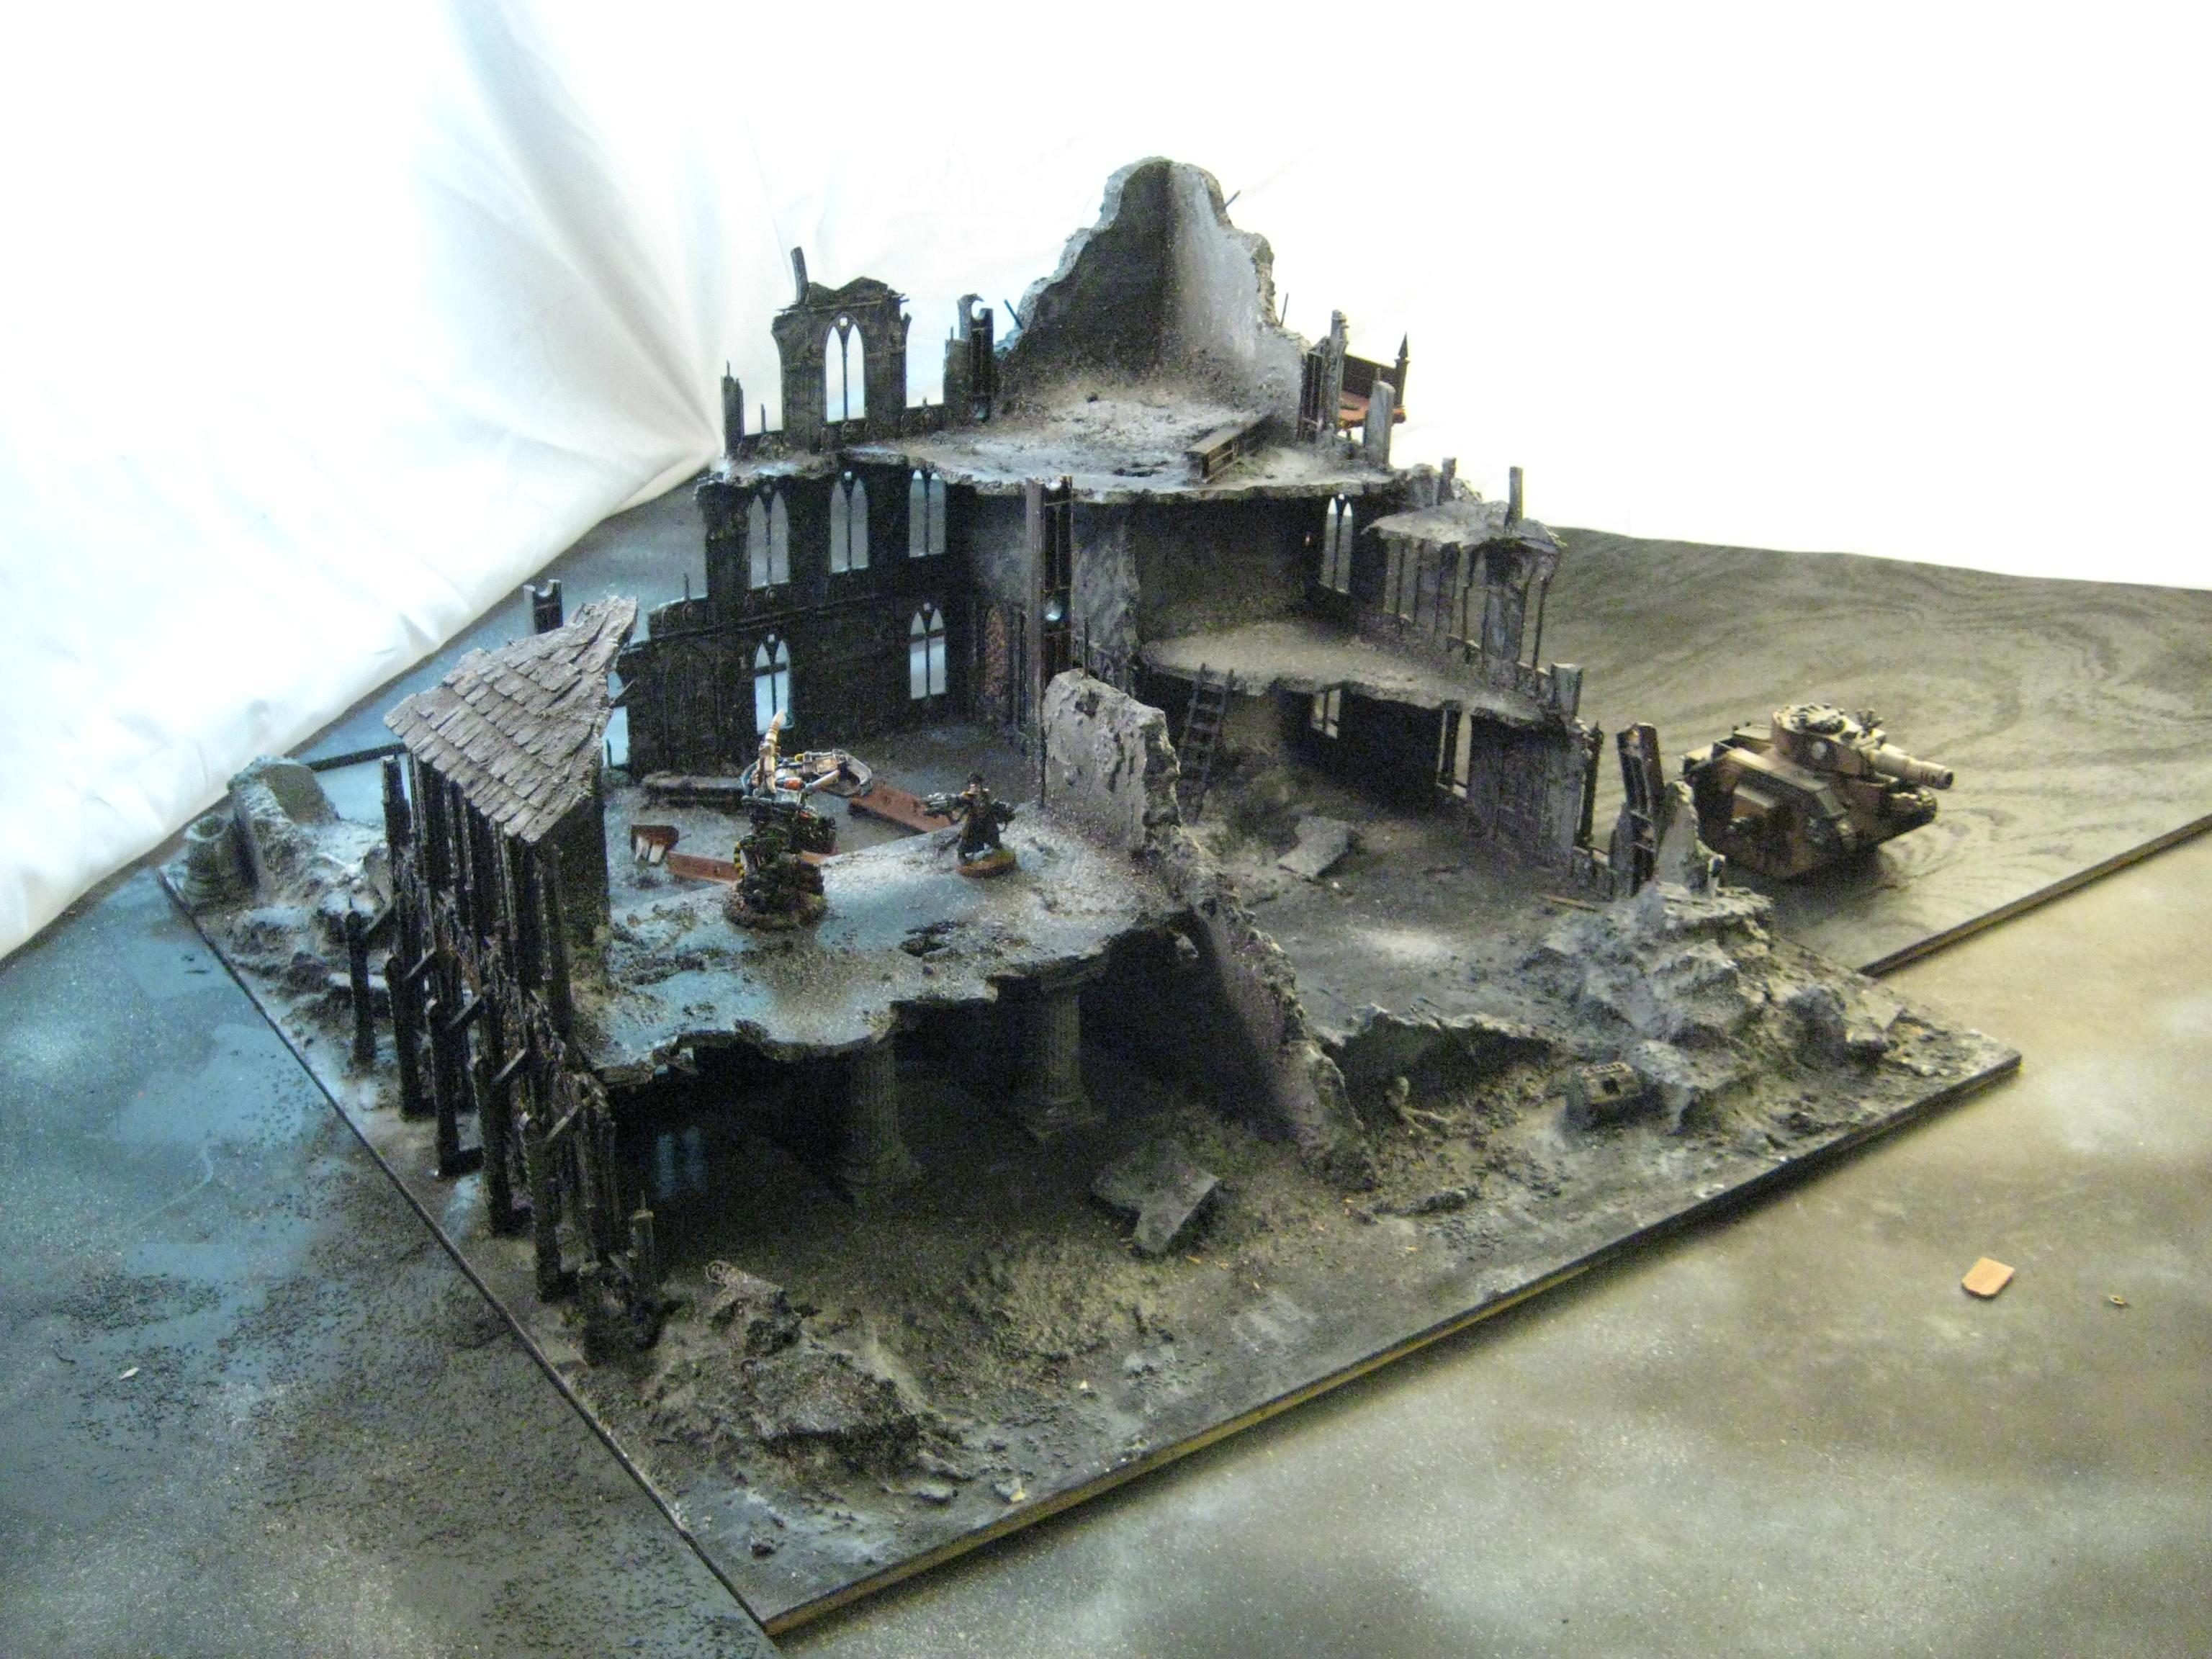 Ruins, Terrain, catherdral 1